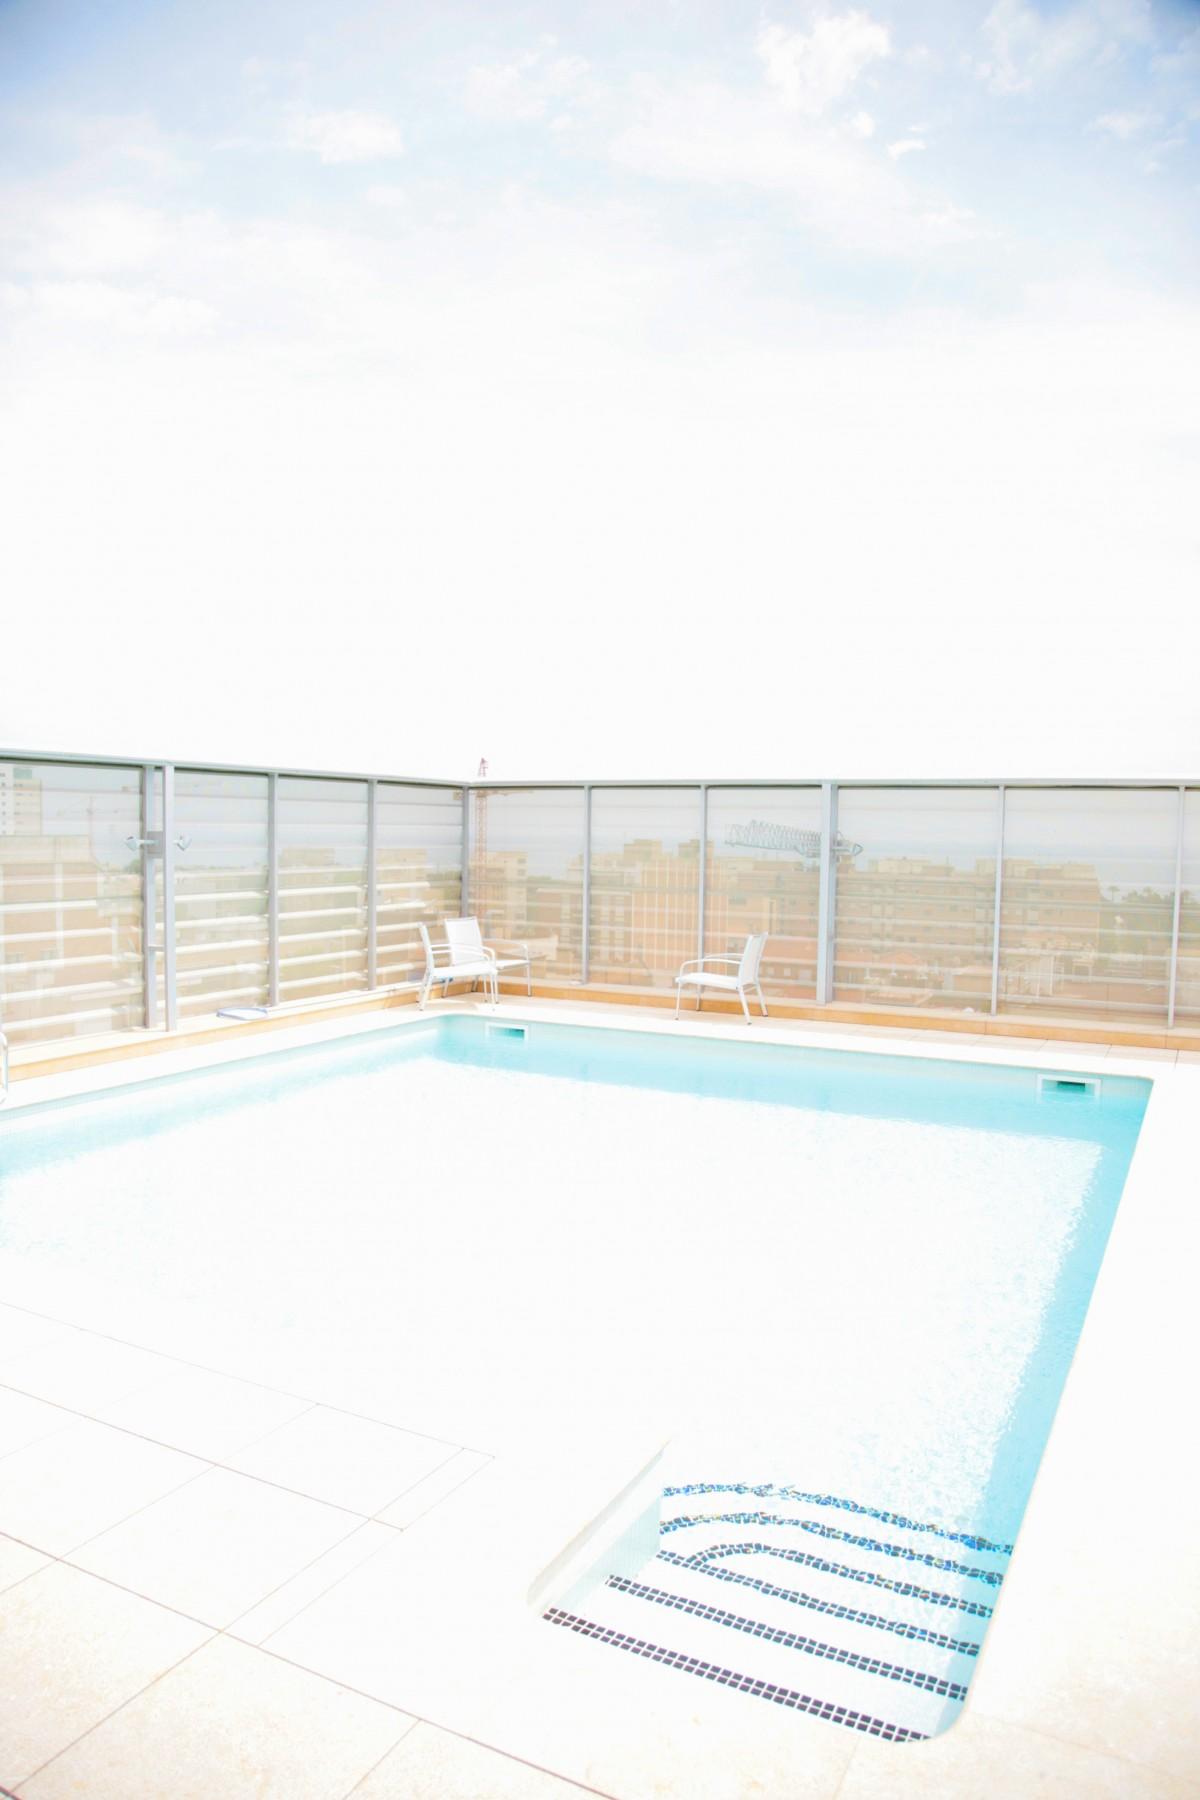 Images gratuites structure sol piscine propri t - Barcelone hotel piscine interieure ...